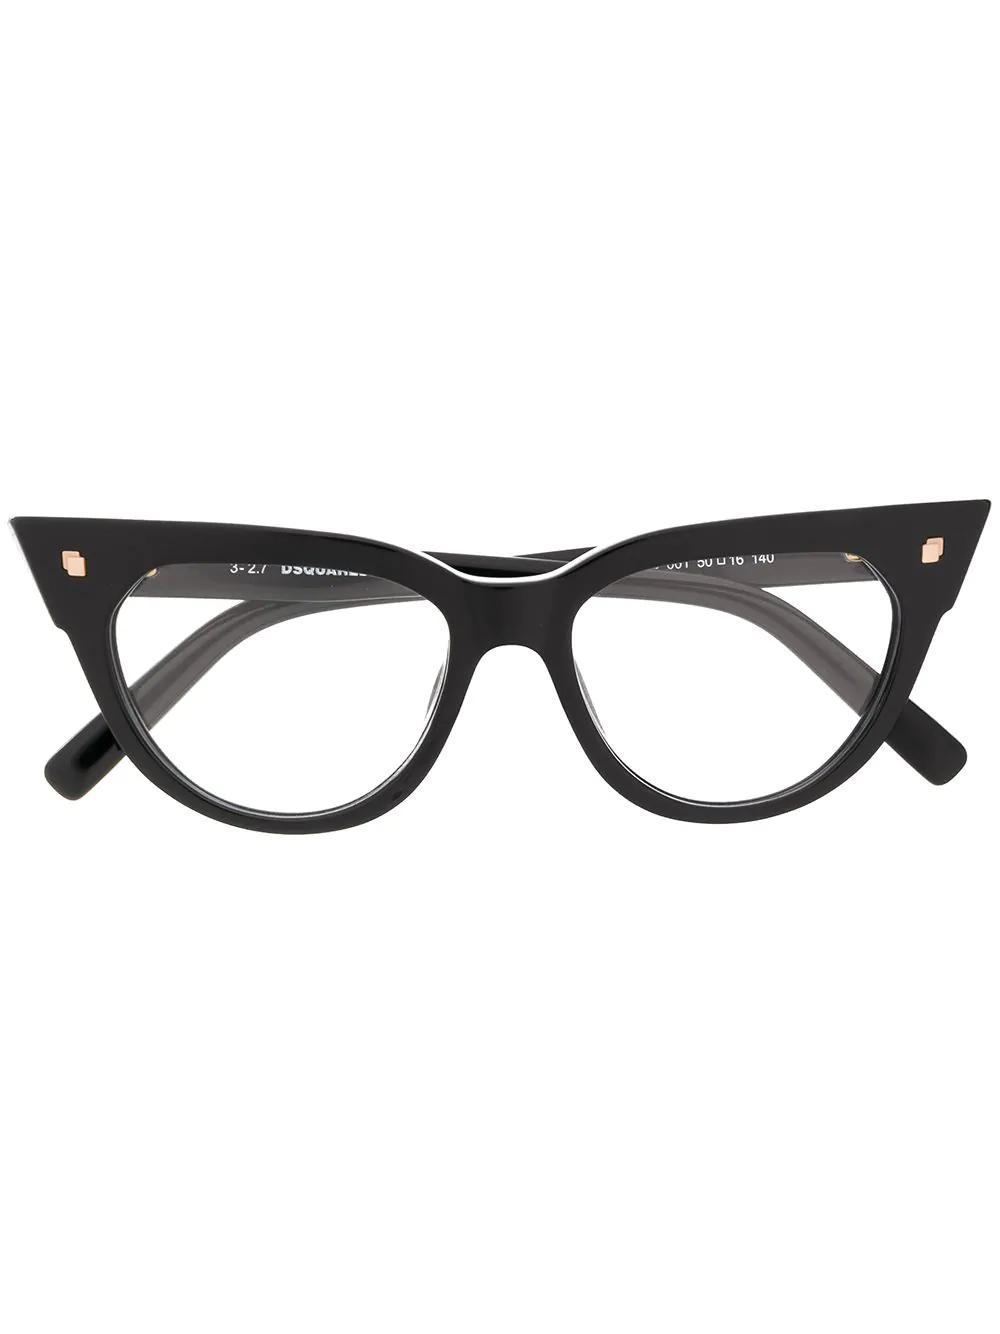 Dsquared2 Eyewear Cat Eye Glasses Farfetch Cat Eye Glasses Cat Eye Glasses Frames Vintage Cat Eye Glasses Frames